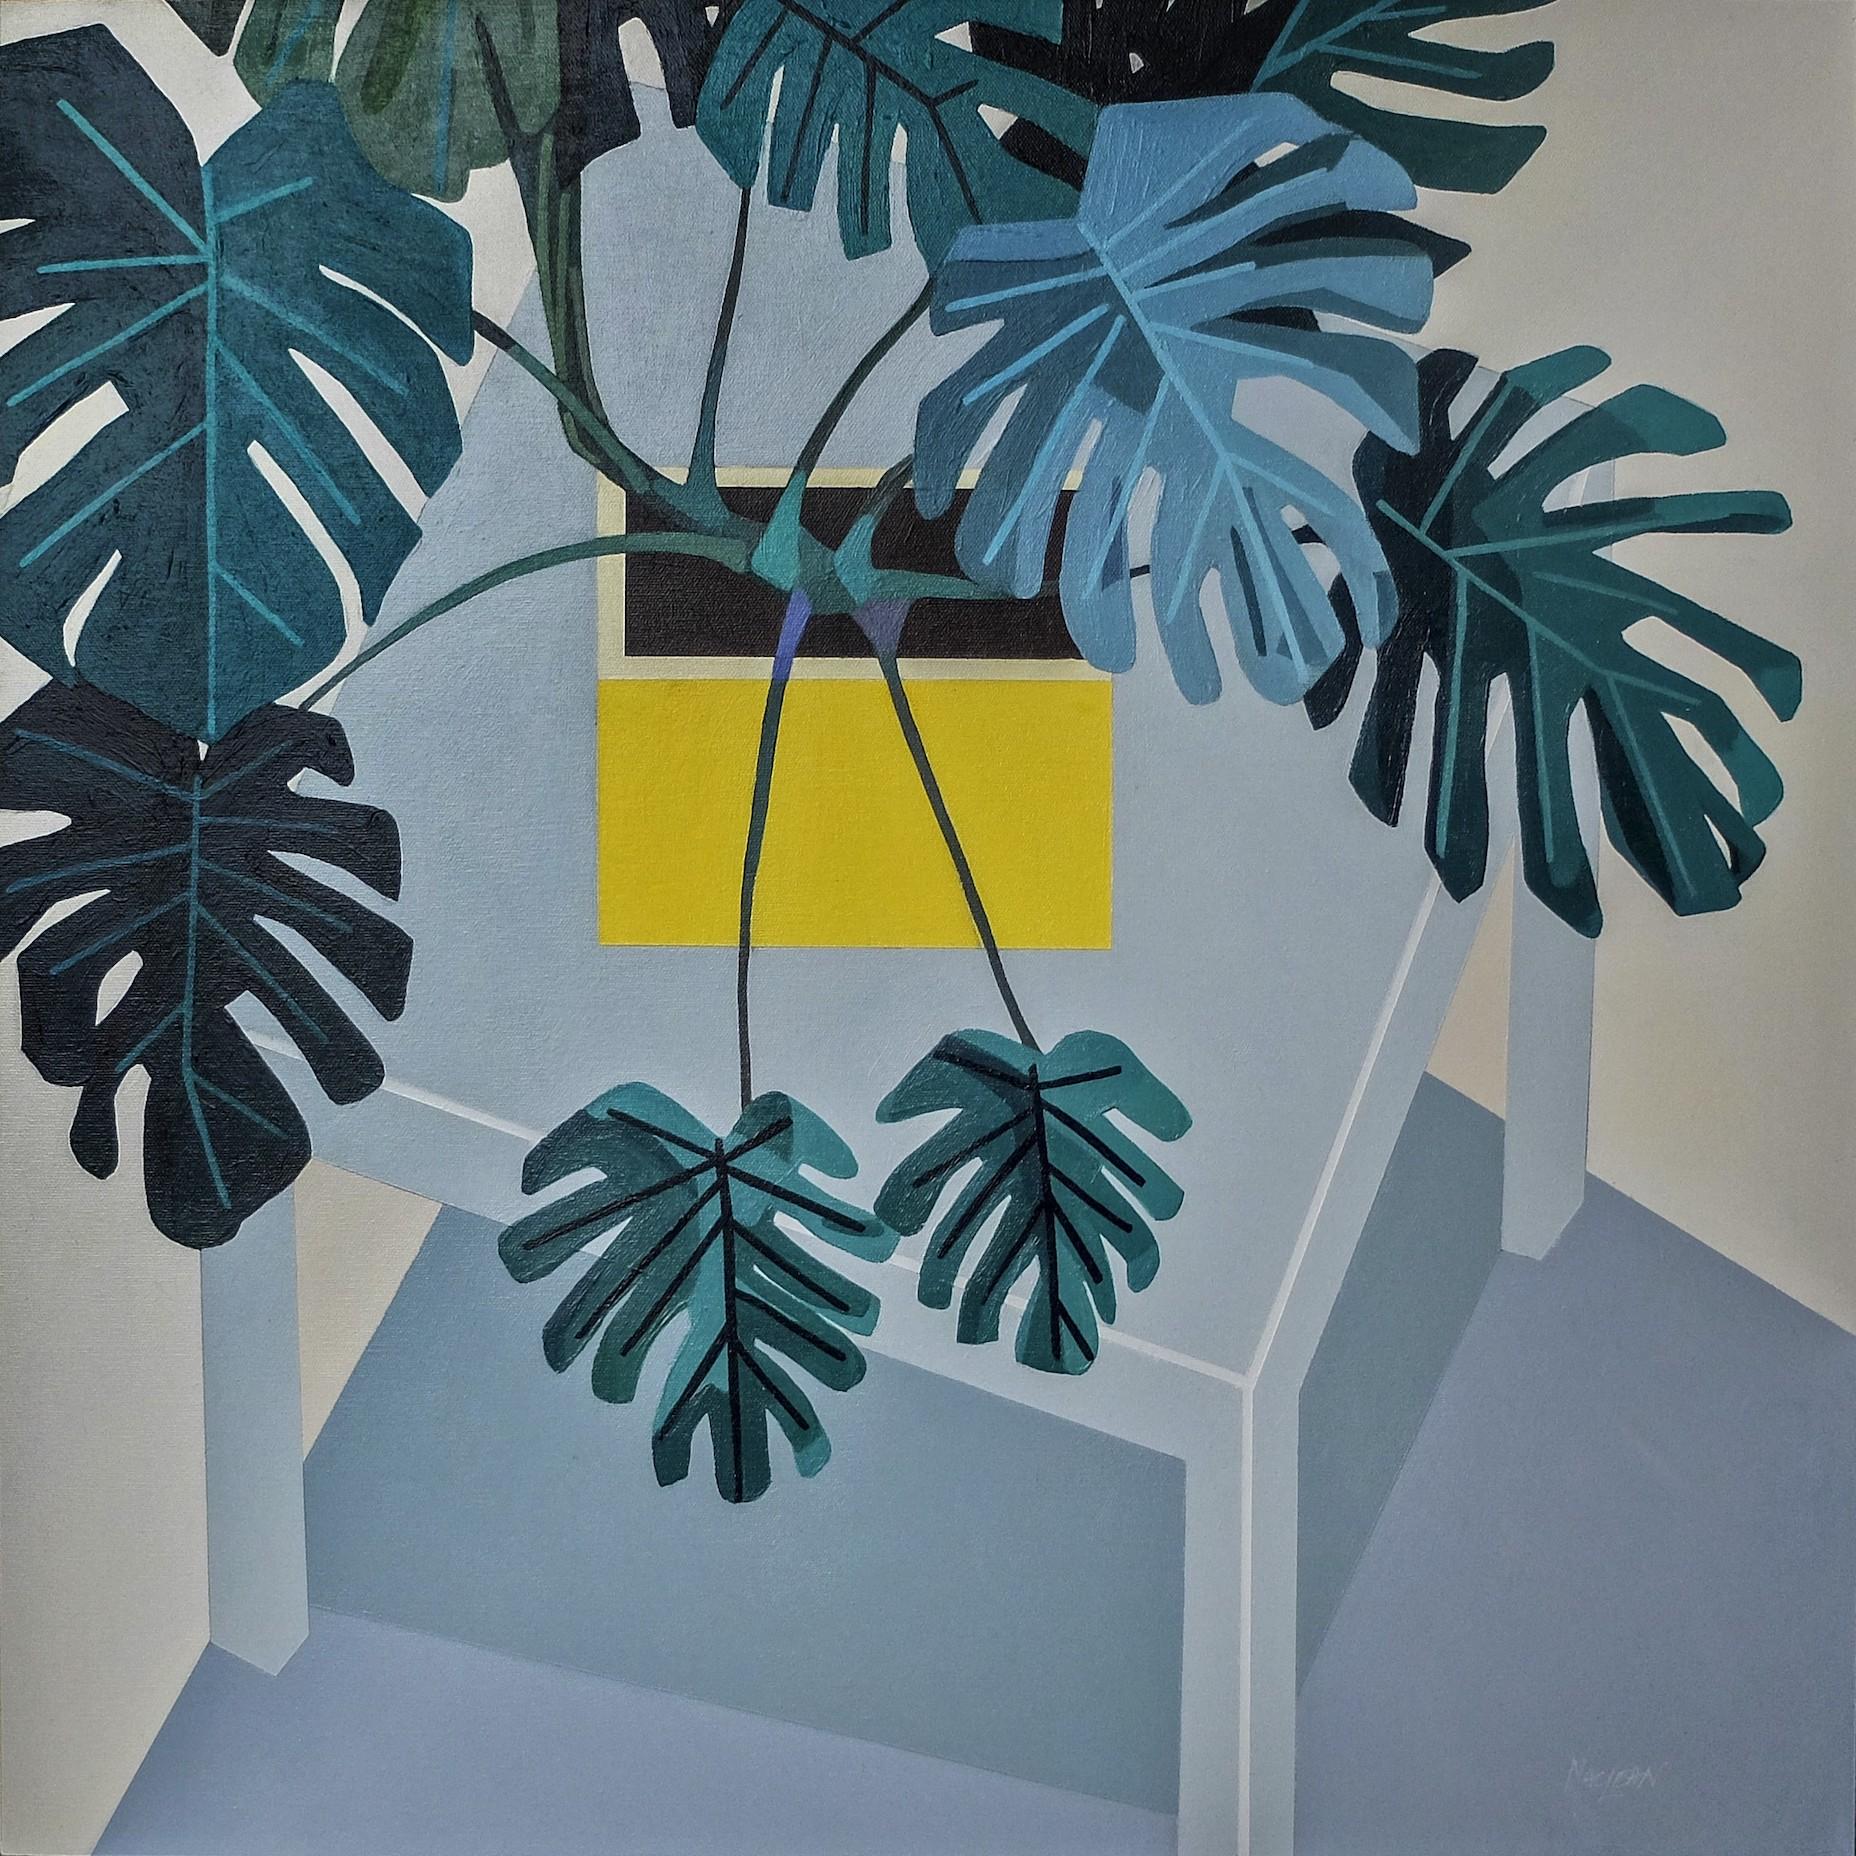 Donald MacLean, Monstera-Deliciosa, Isometric, 2019, £950, acrylic, original, Alpha Art Gallery